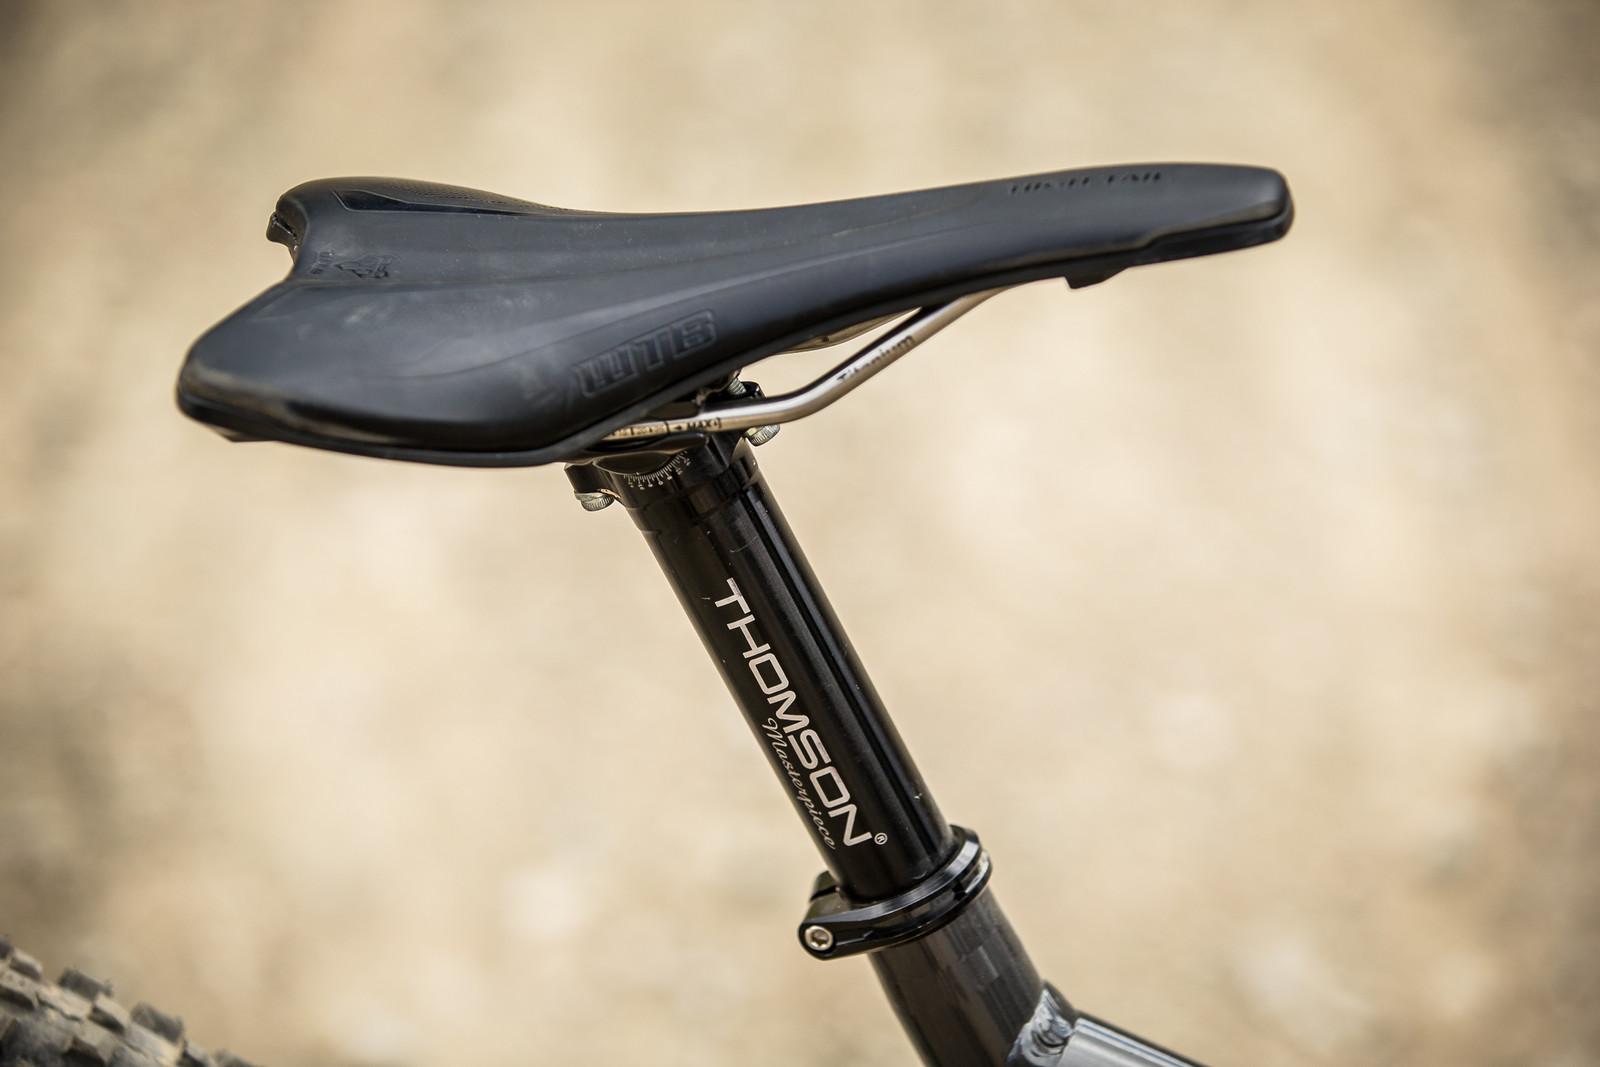 WTB Saddle - WINNING BIKE - Amaury Pierron's Commencal Supreme DH 29 - Mountain Biking Pictures - Vital MTB